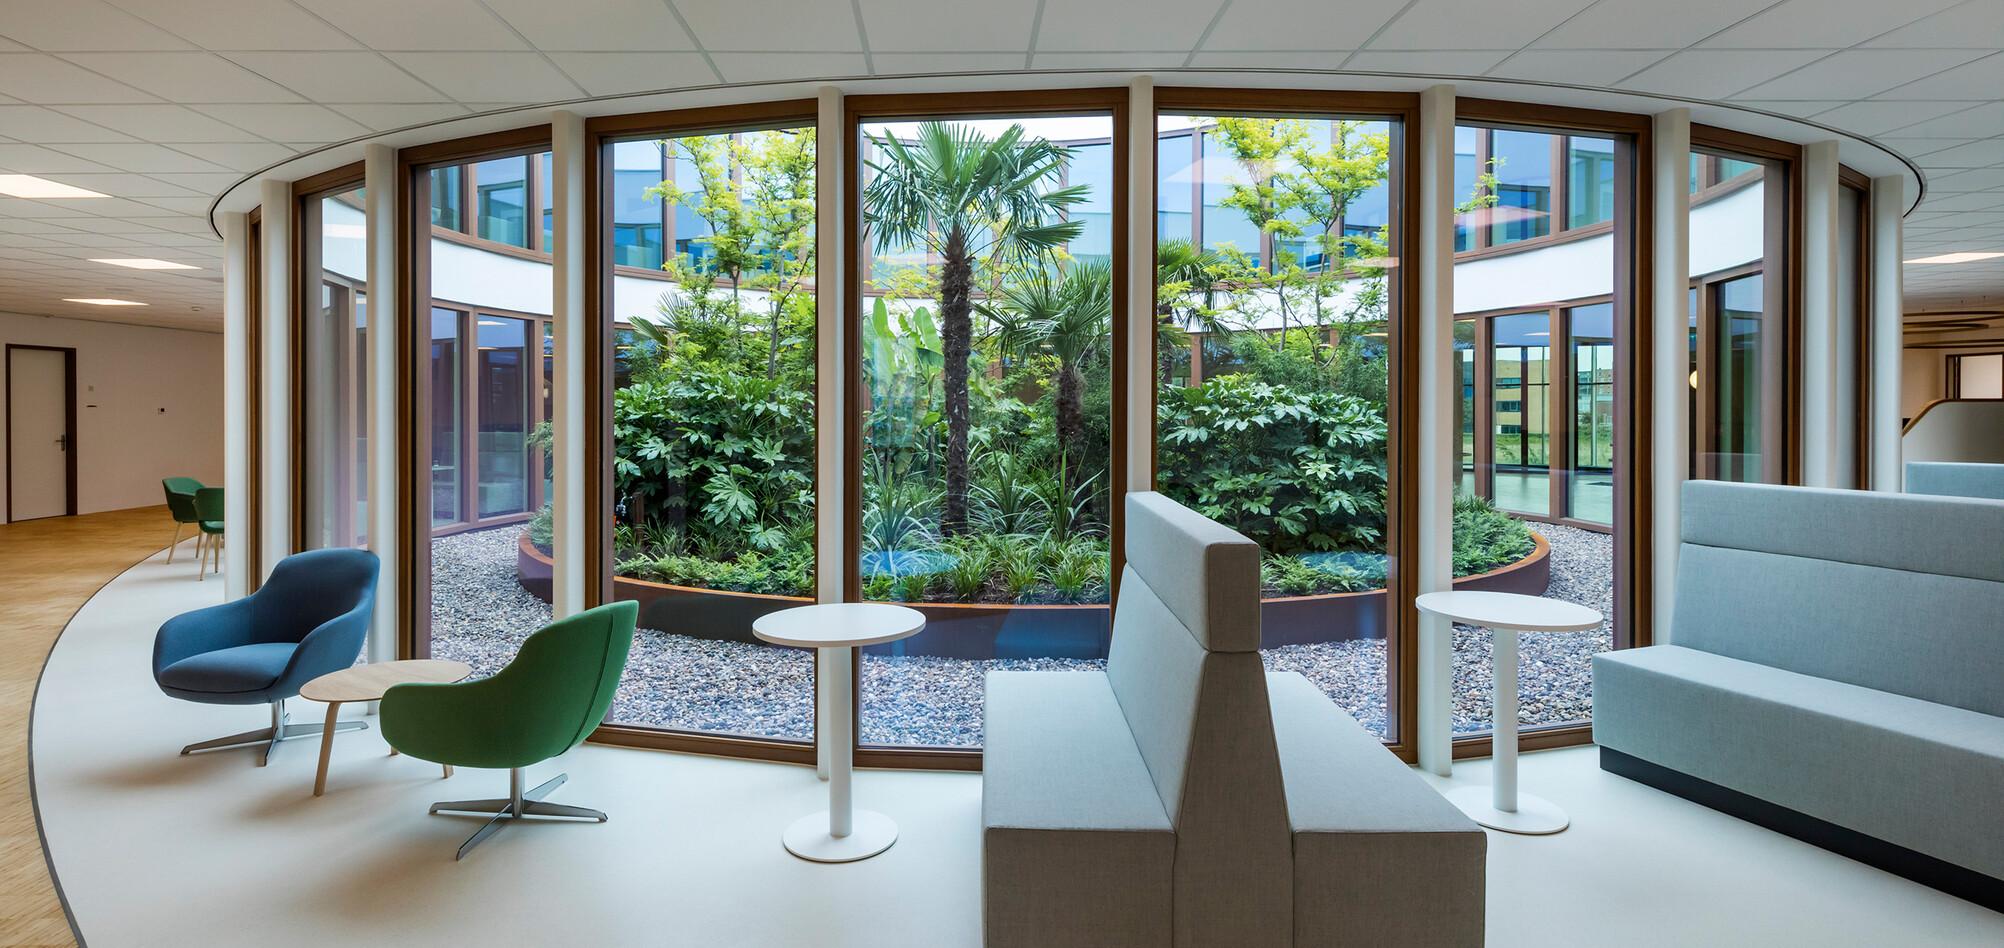 Royal Ahrend healthcare project interior view of Oogcentrum Noordholland in Heerhugowaard SB200611